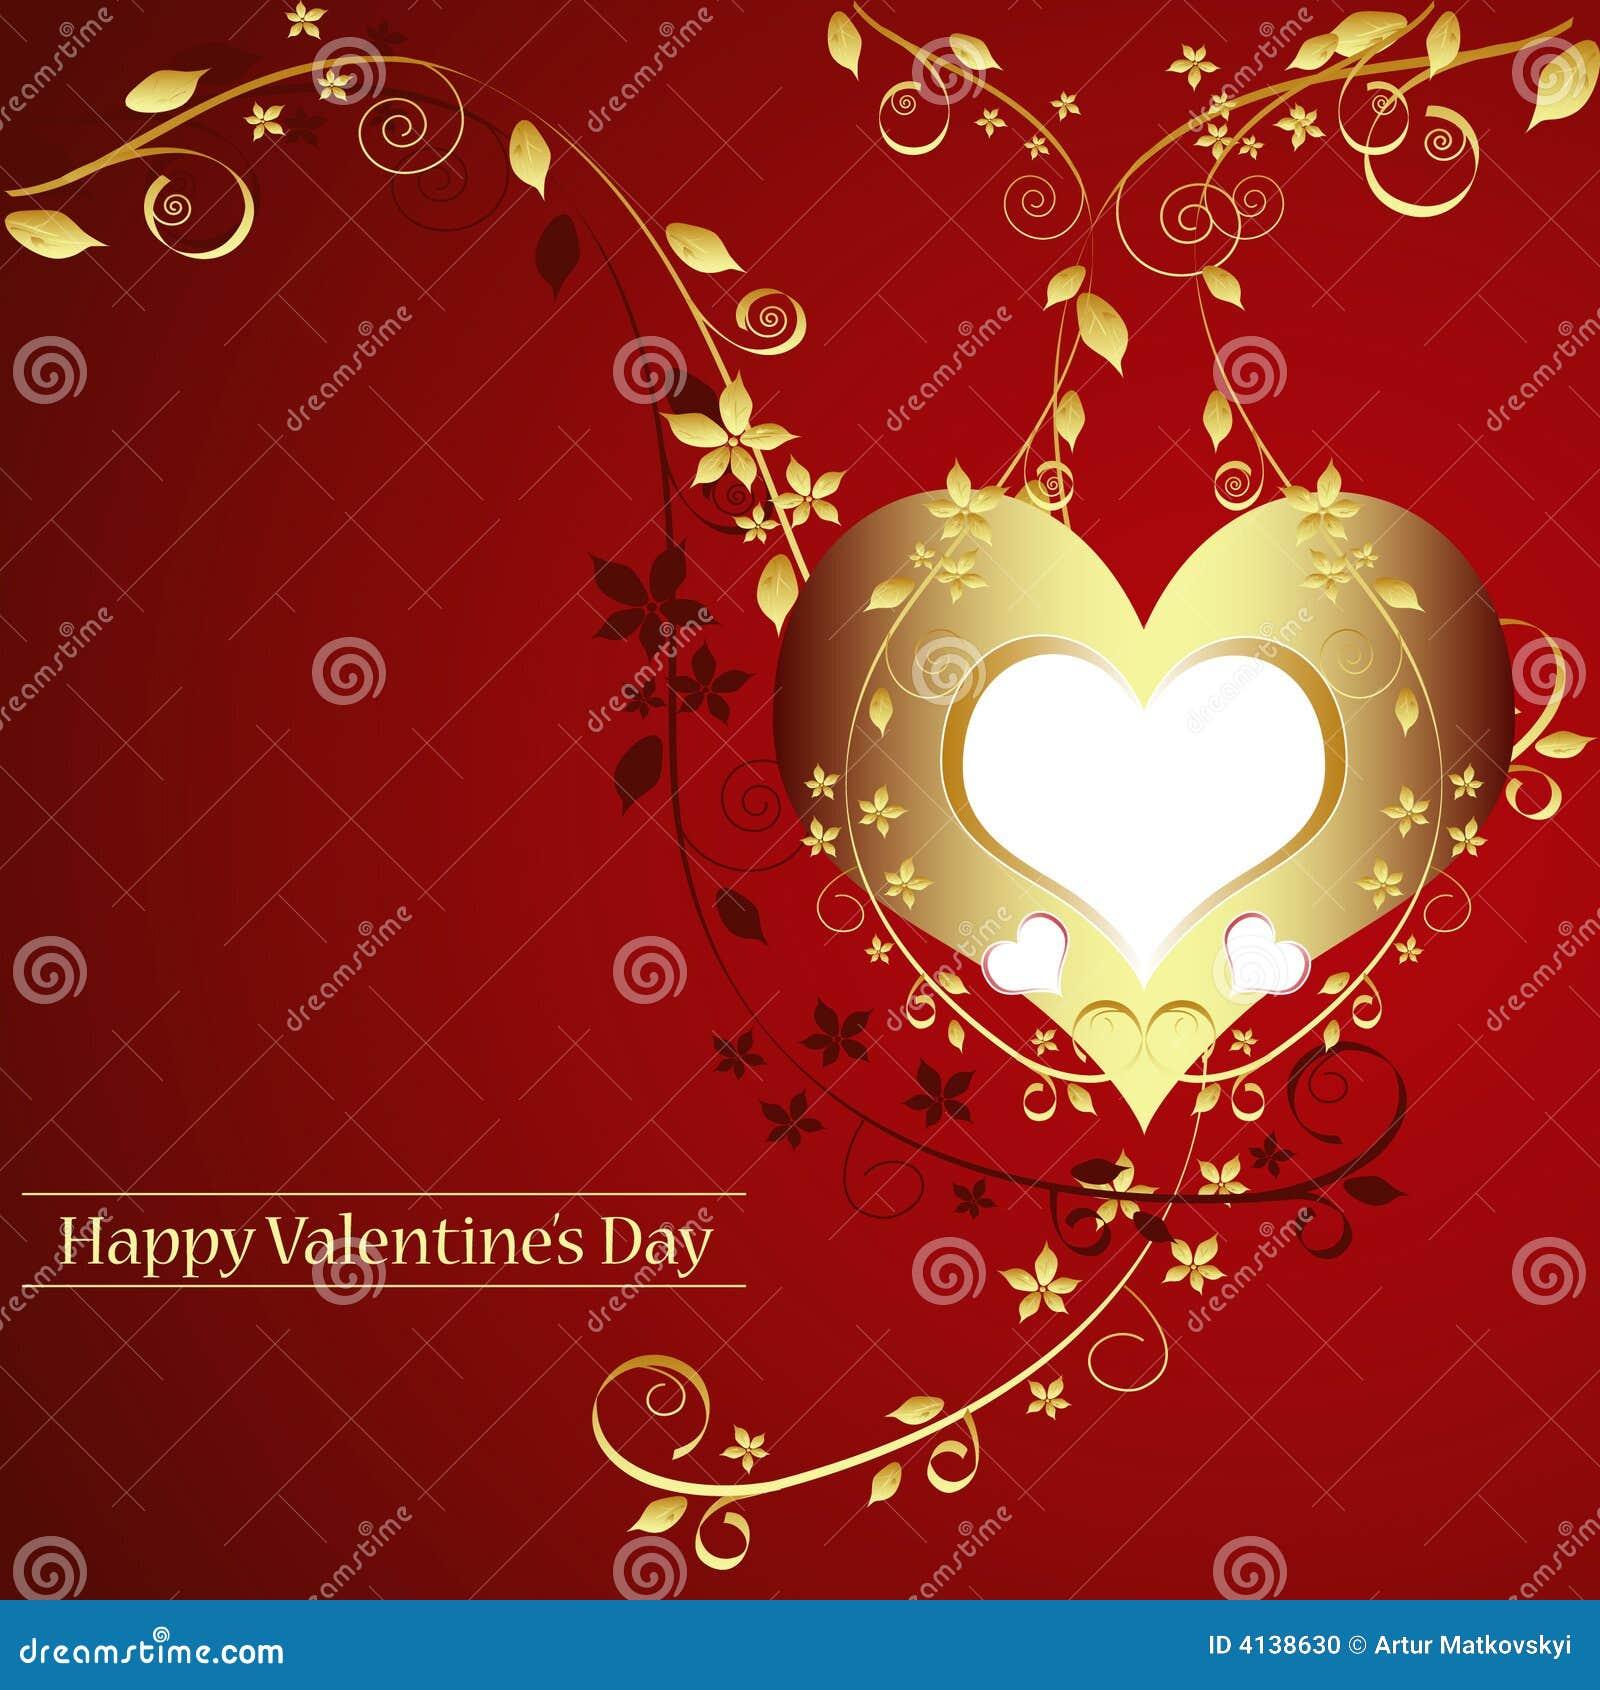 Golden Valentines Card Photo Image 4138630 – Valentines Card Photo